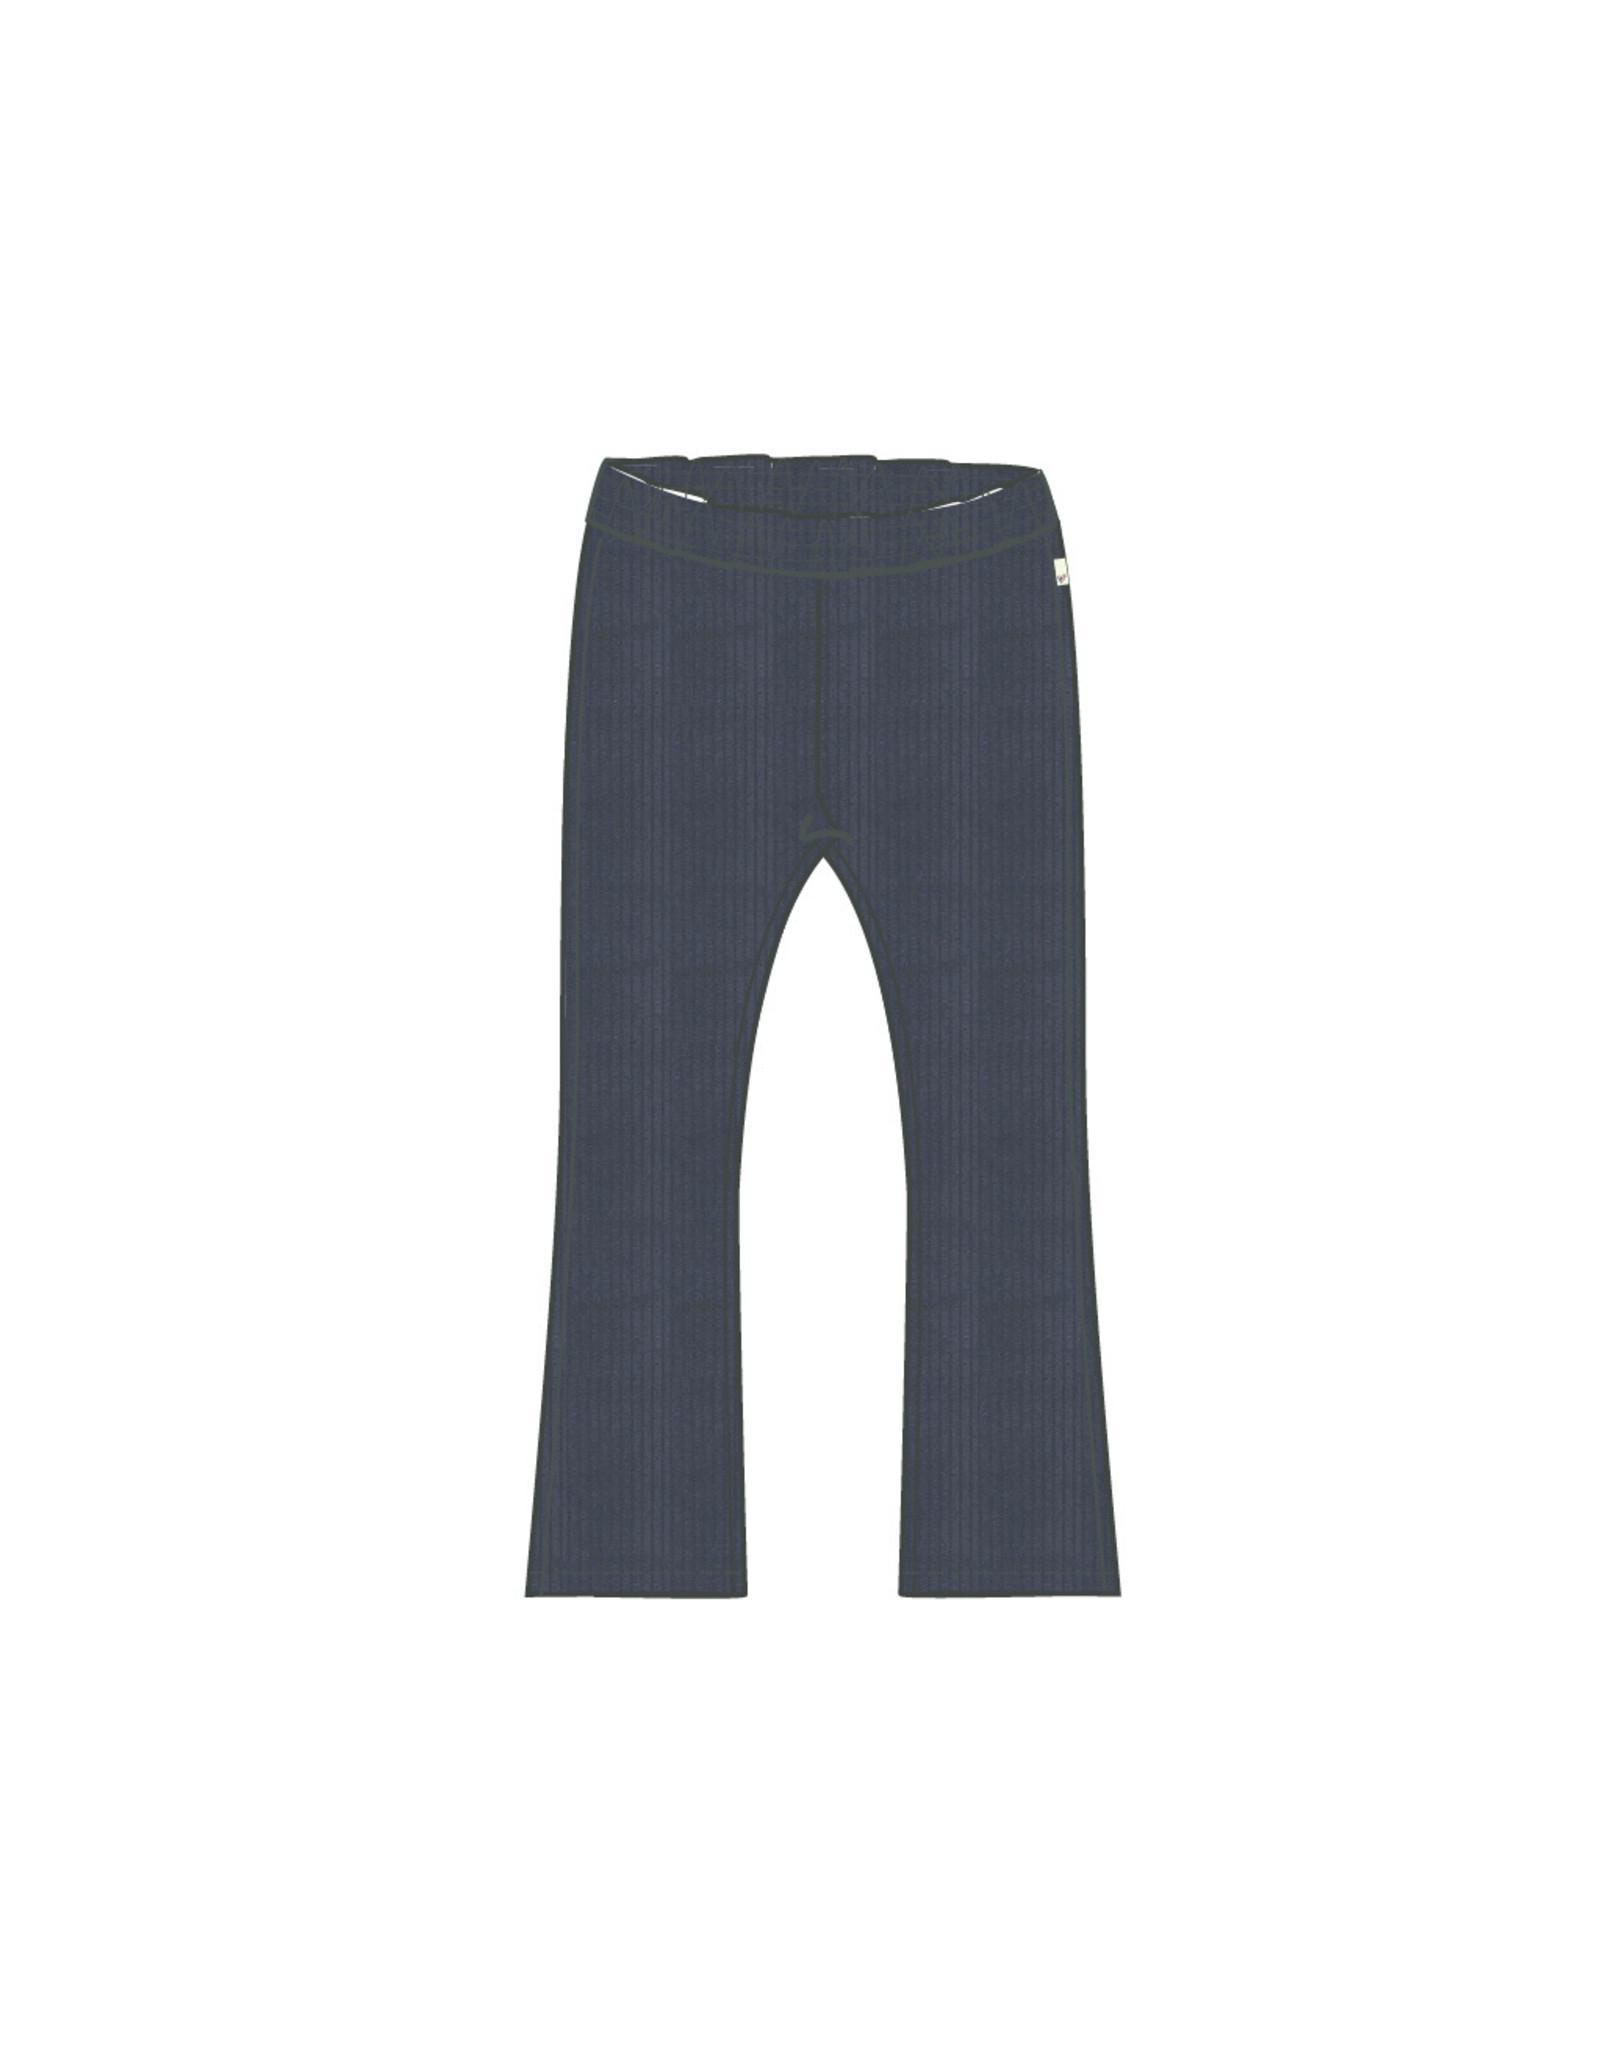 Moodstreet Moodstreet 5600 flared pants velours navy